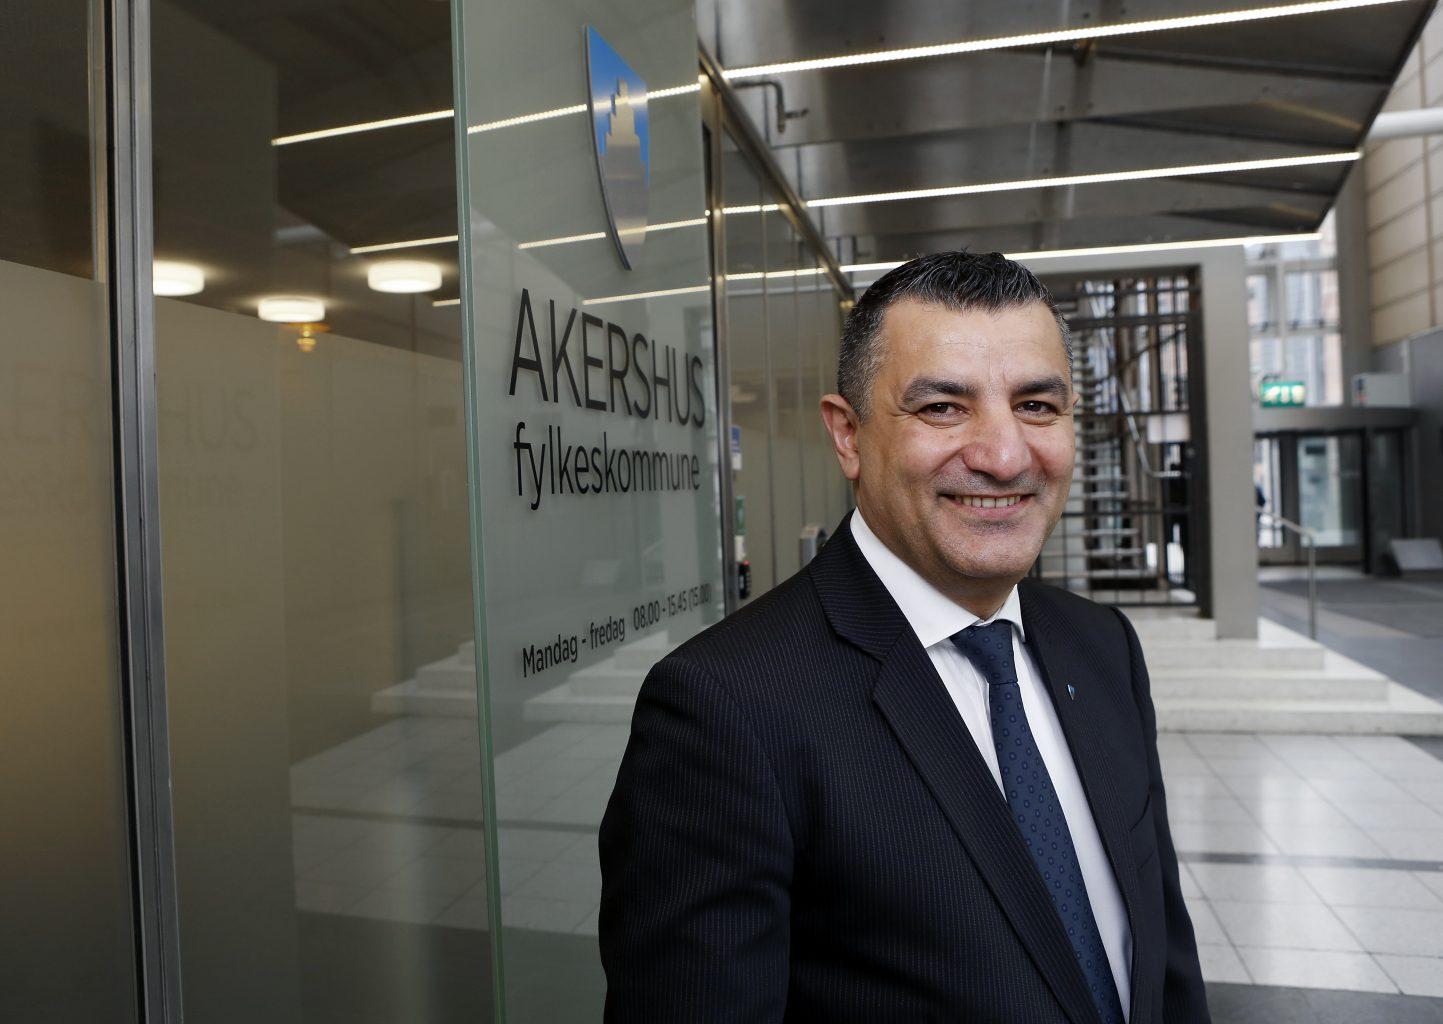 Administrerernde direktør - Jafar Altememy